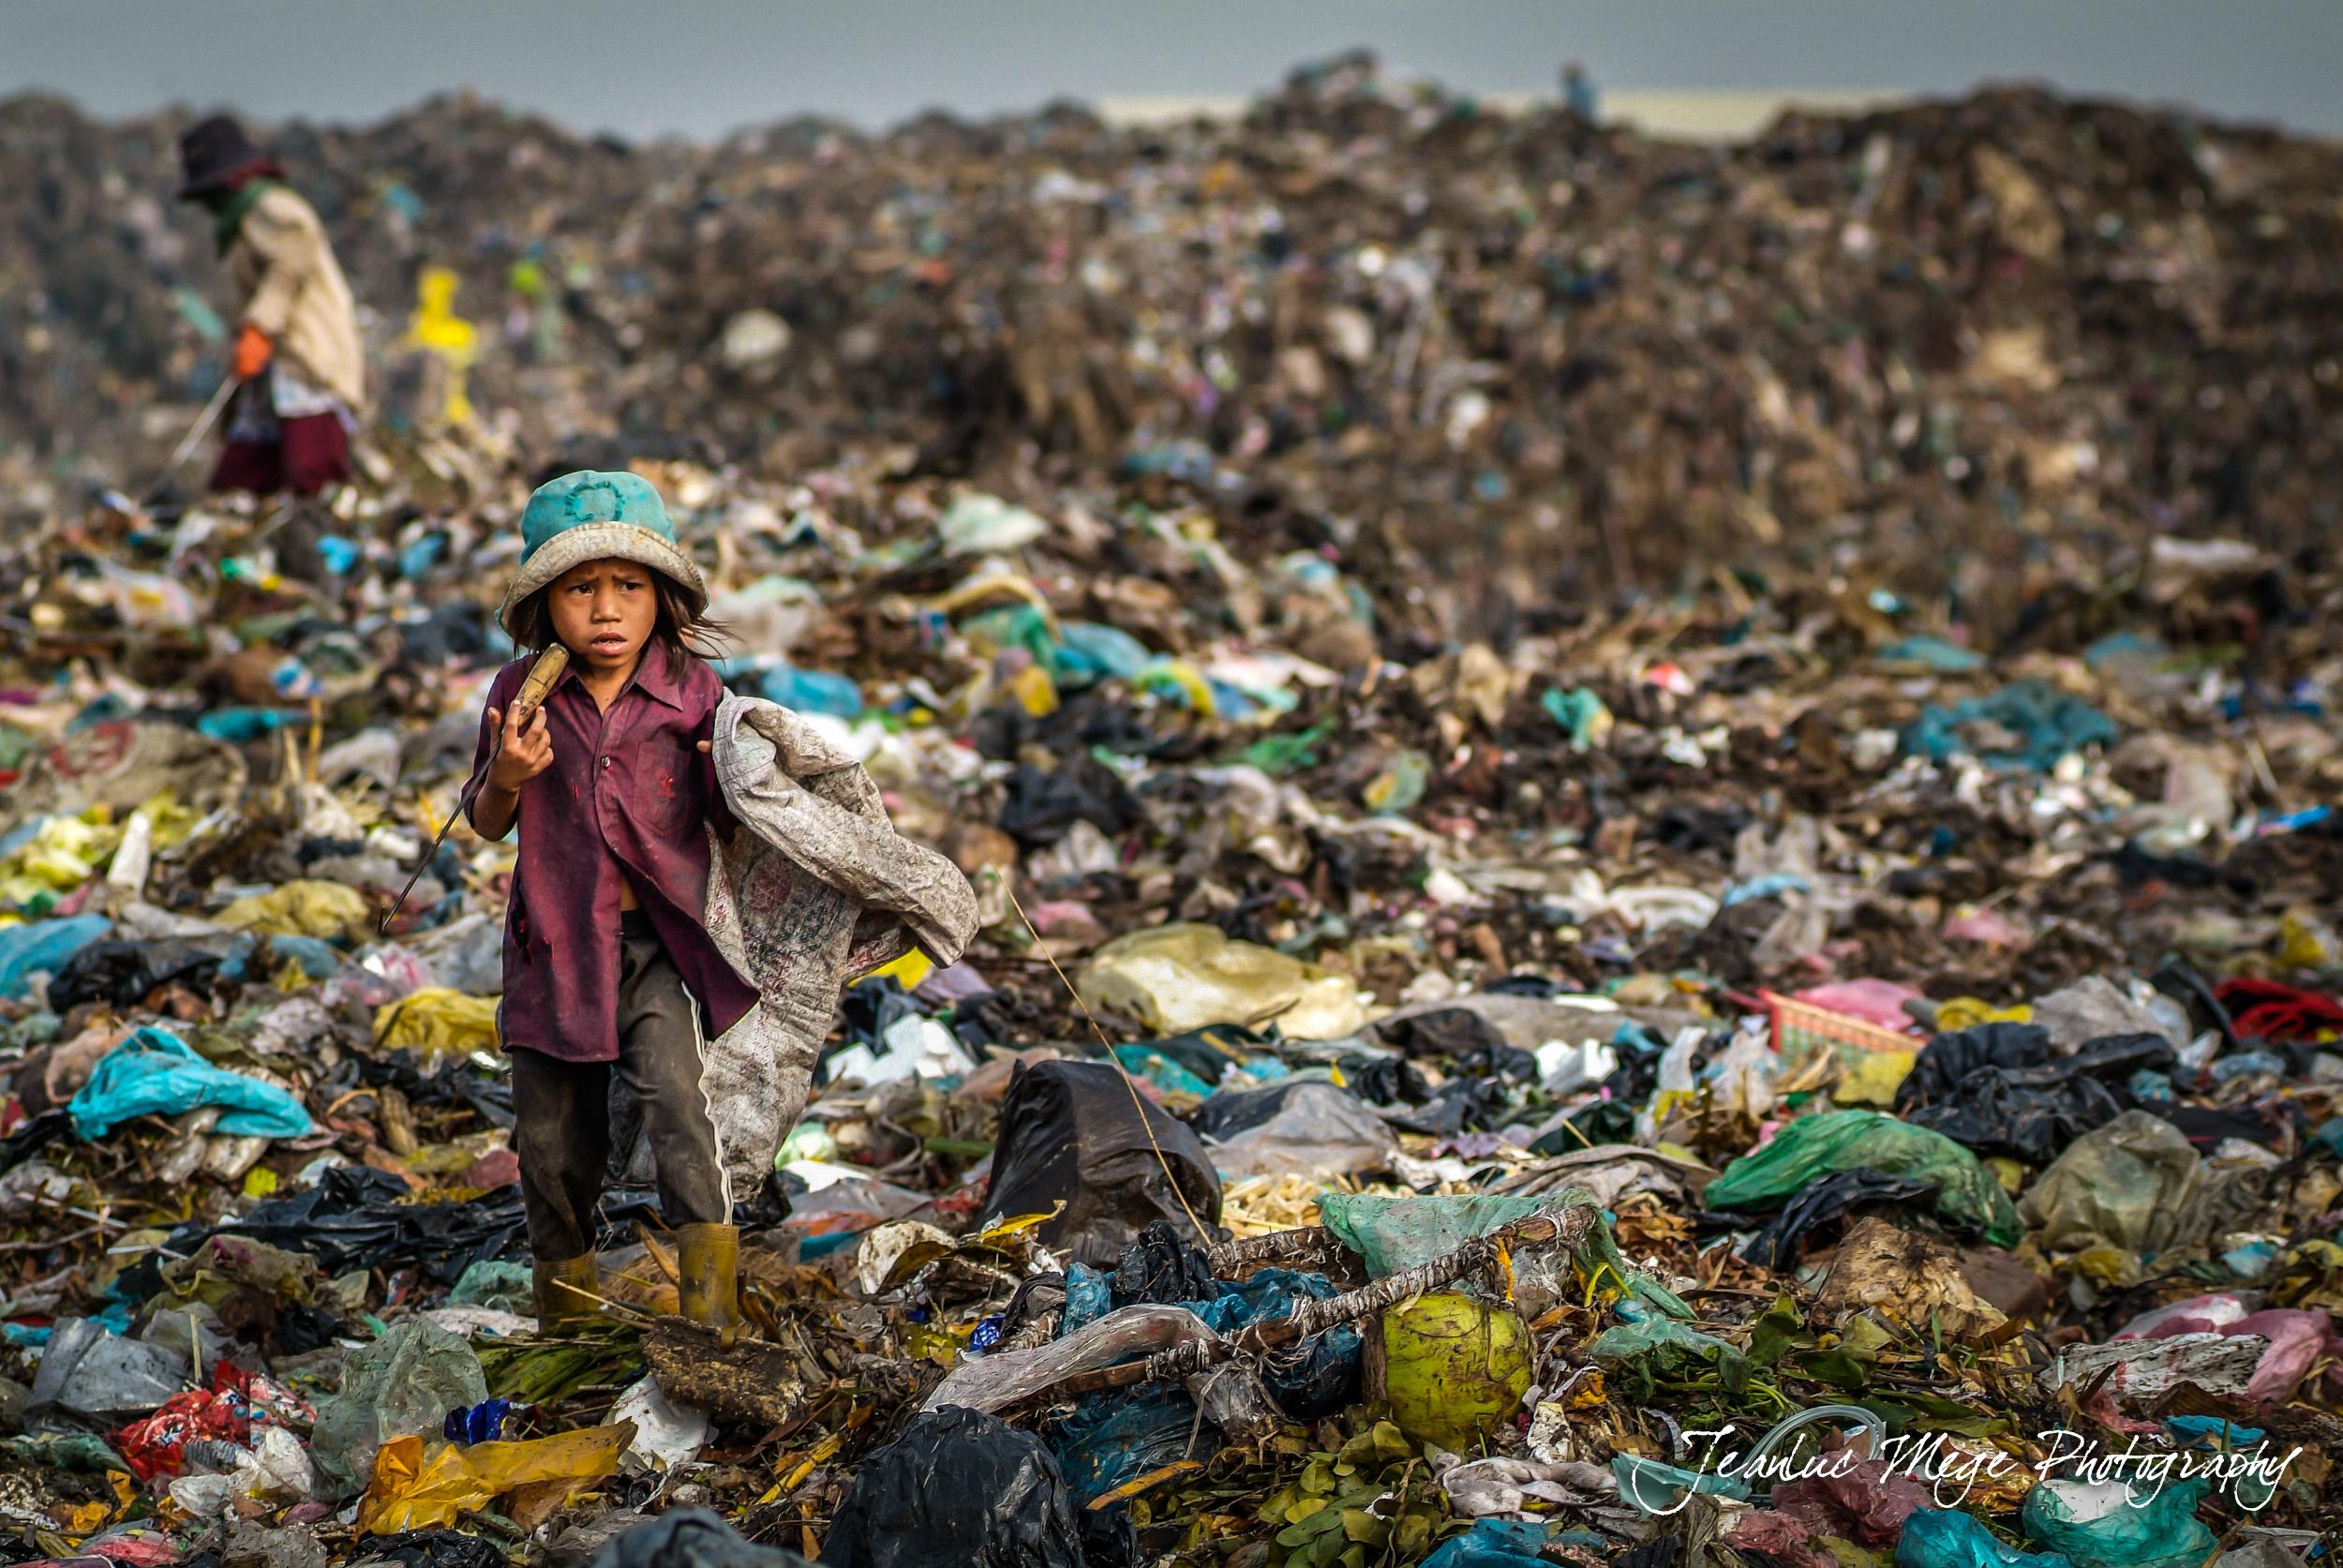 Jean Luc Mege Cambodia-8495.jpg